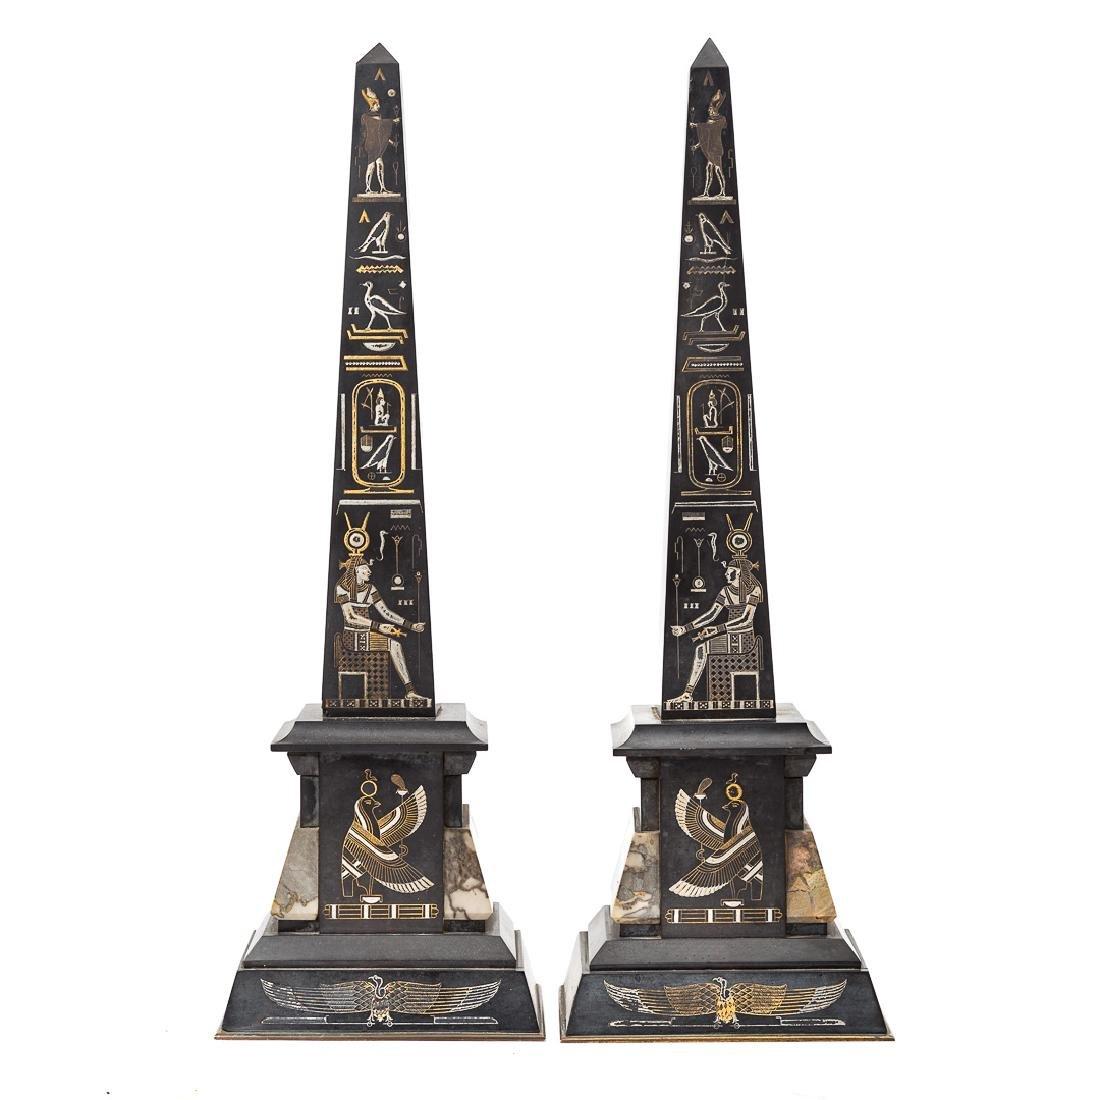 Egyptian revival three piece clock garniture - 5